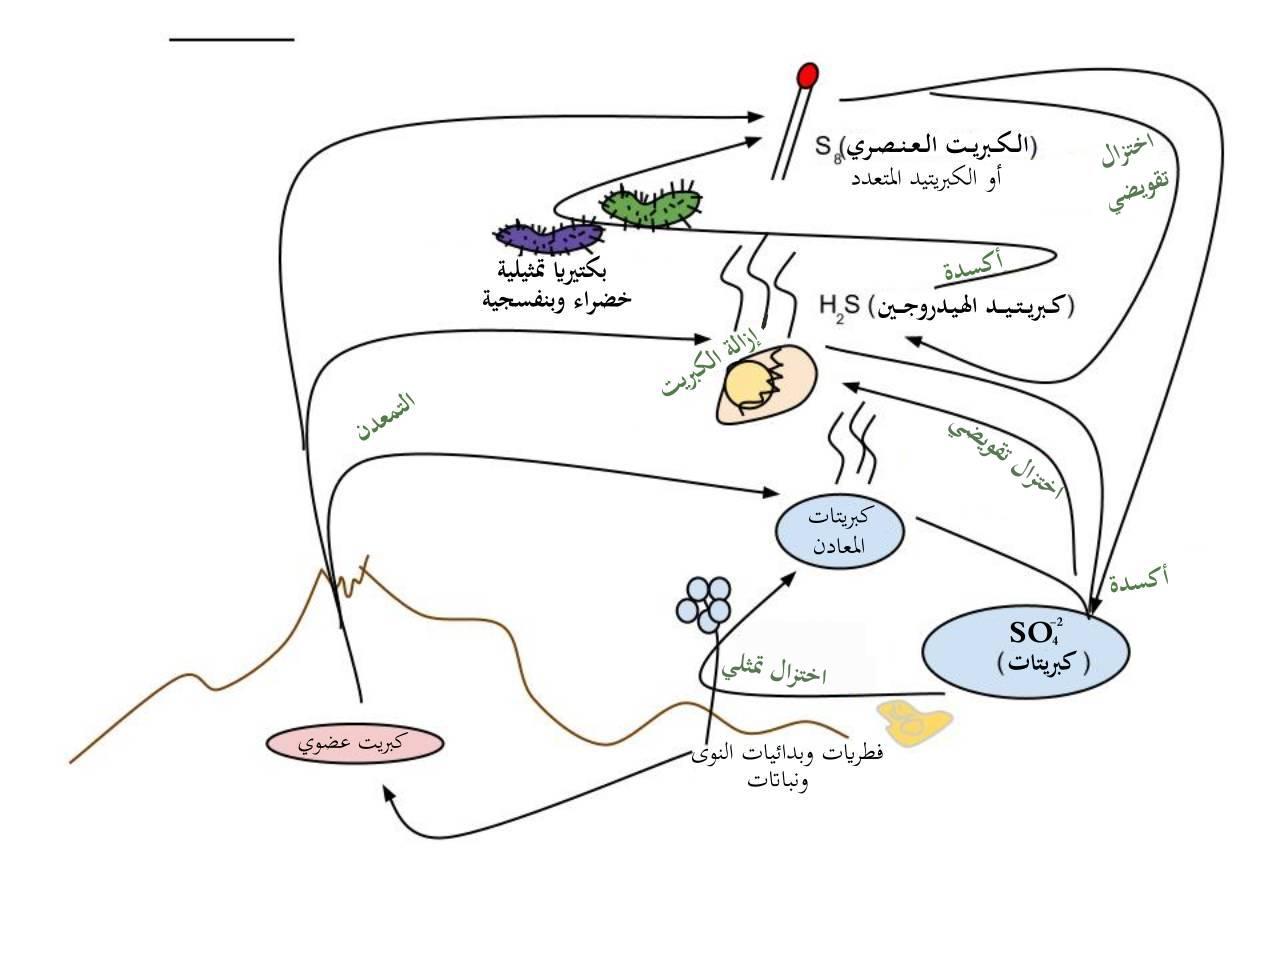 hight resolution of file sulfur cycle arabic jpg